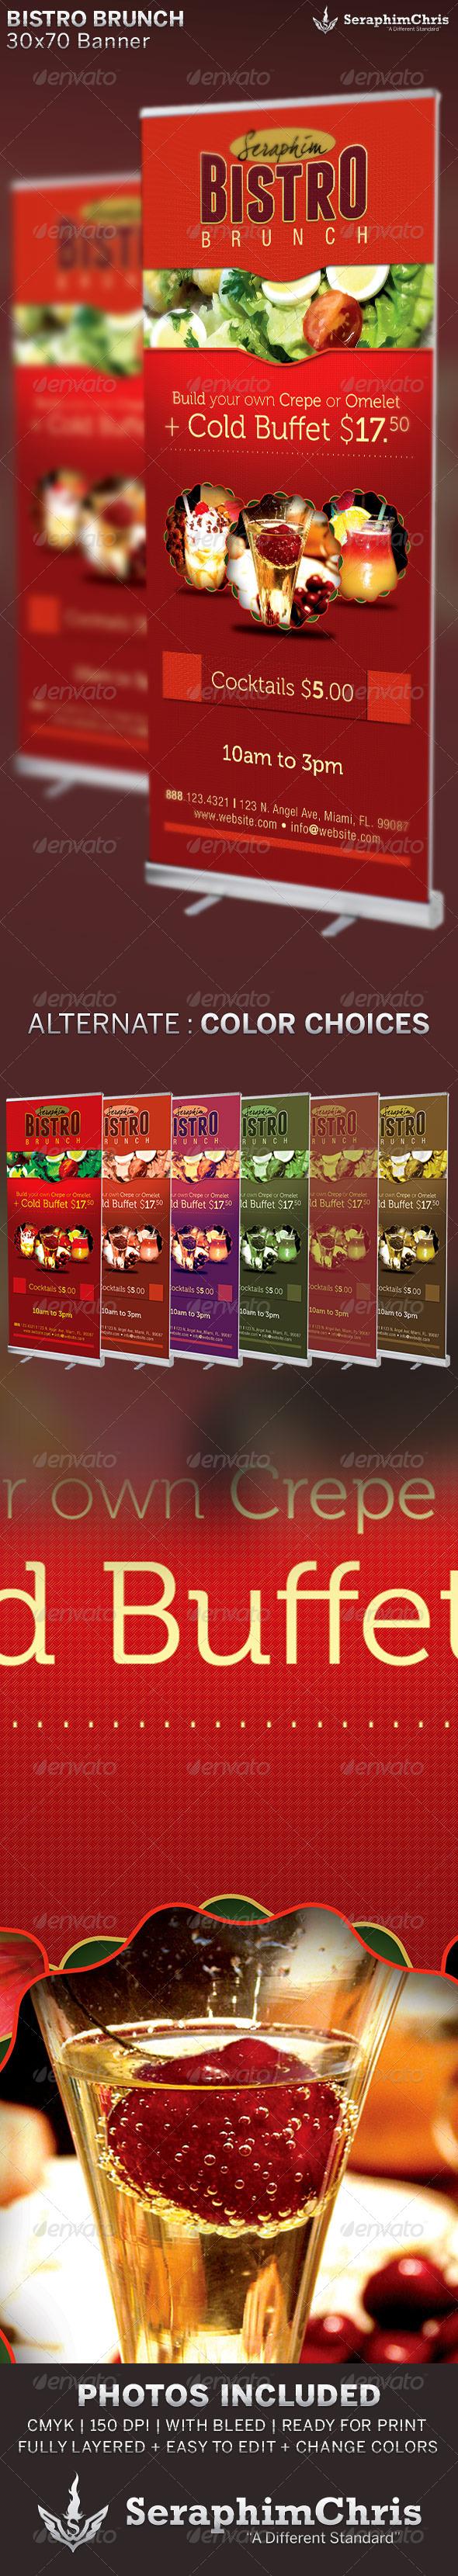 Bistro Brunch: Restaurant Banner Template - Signage Print Templates